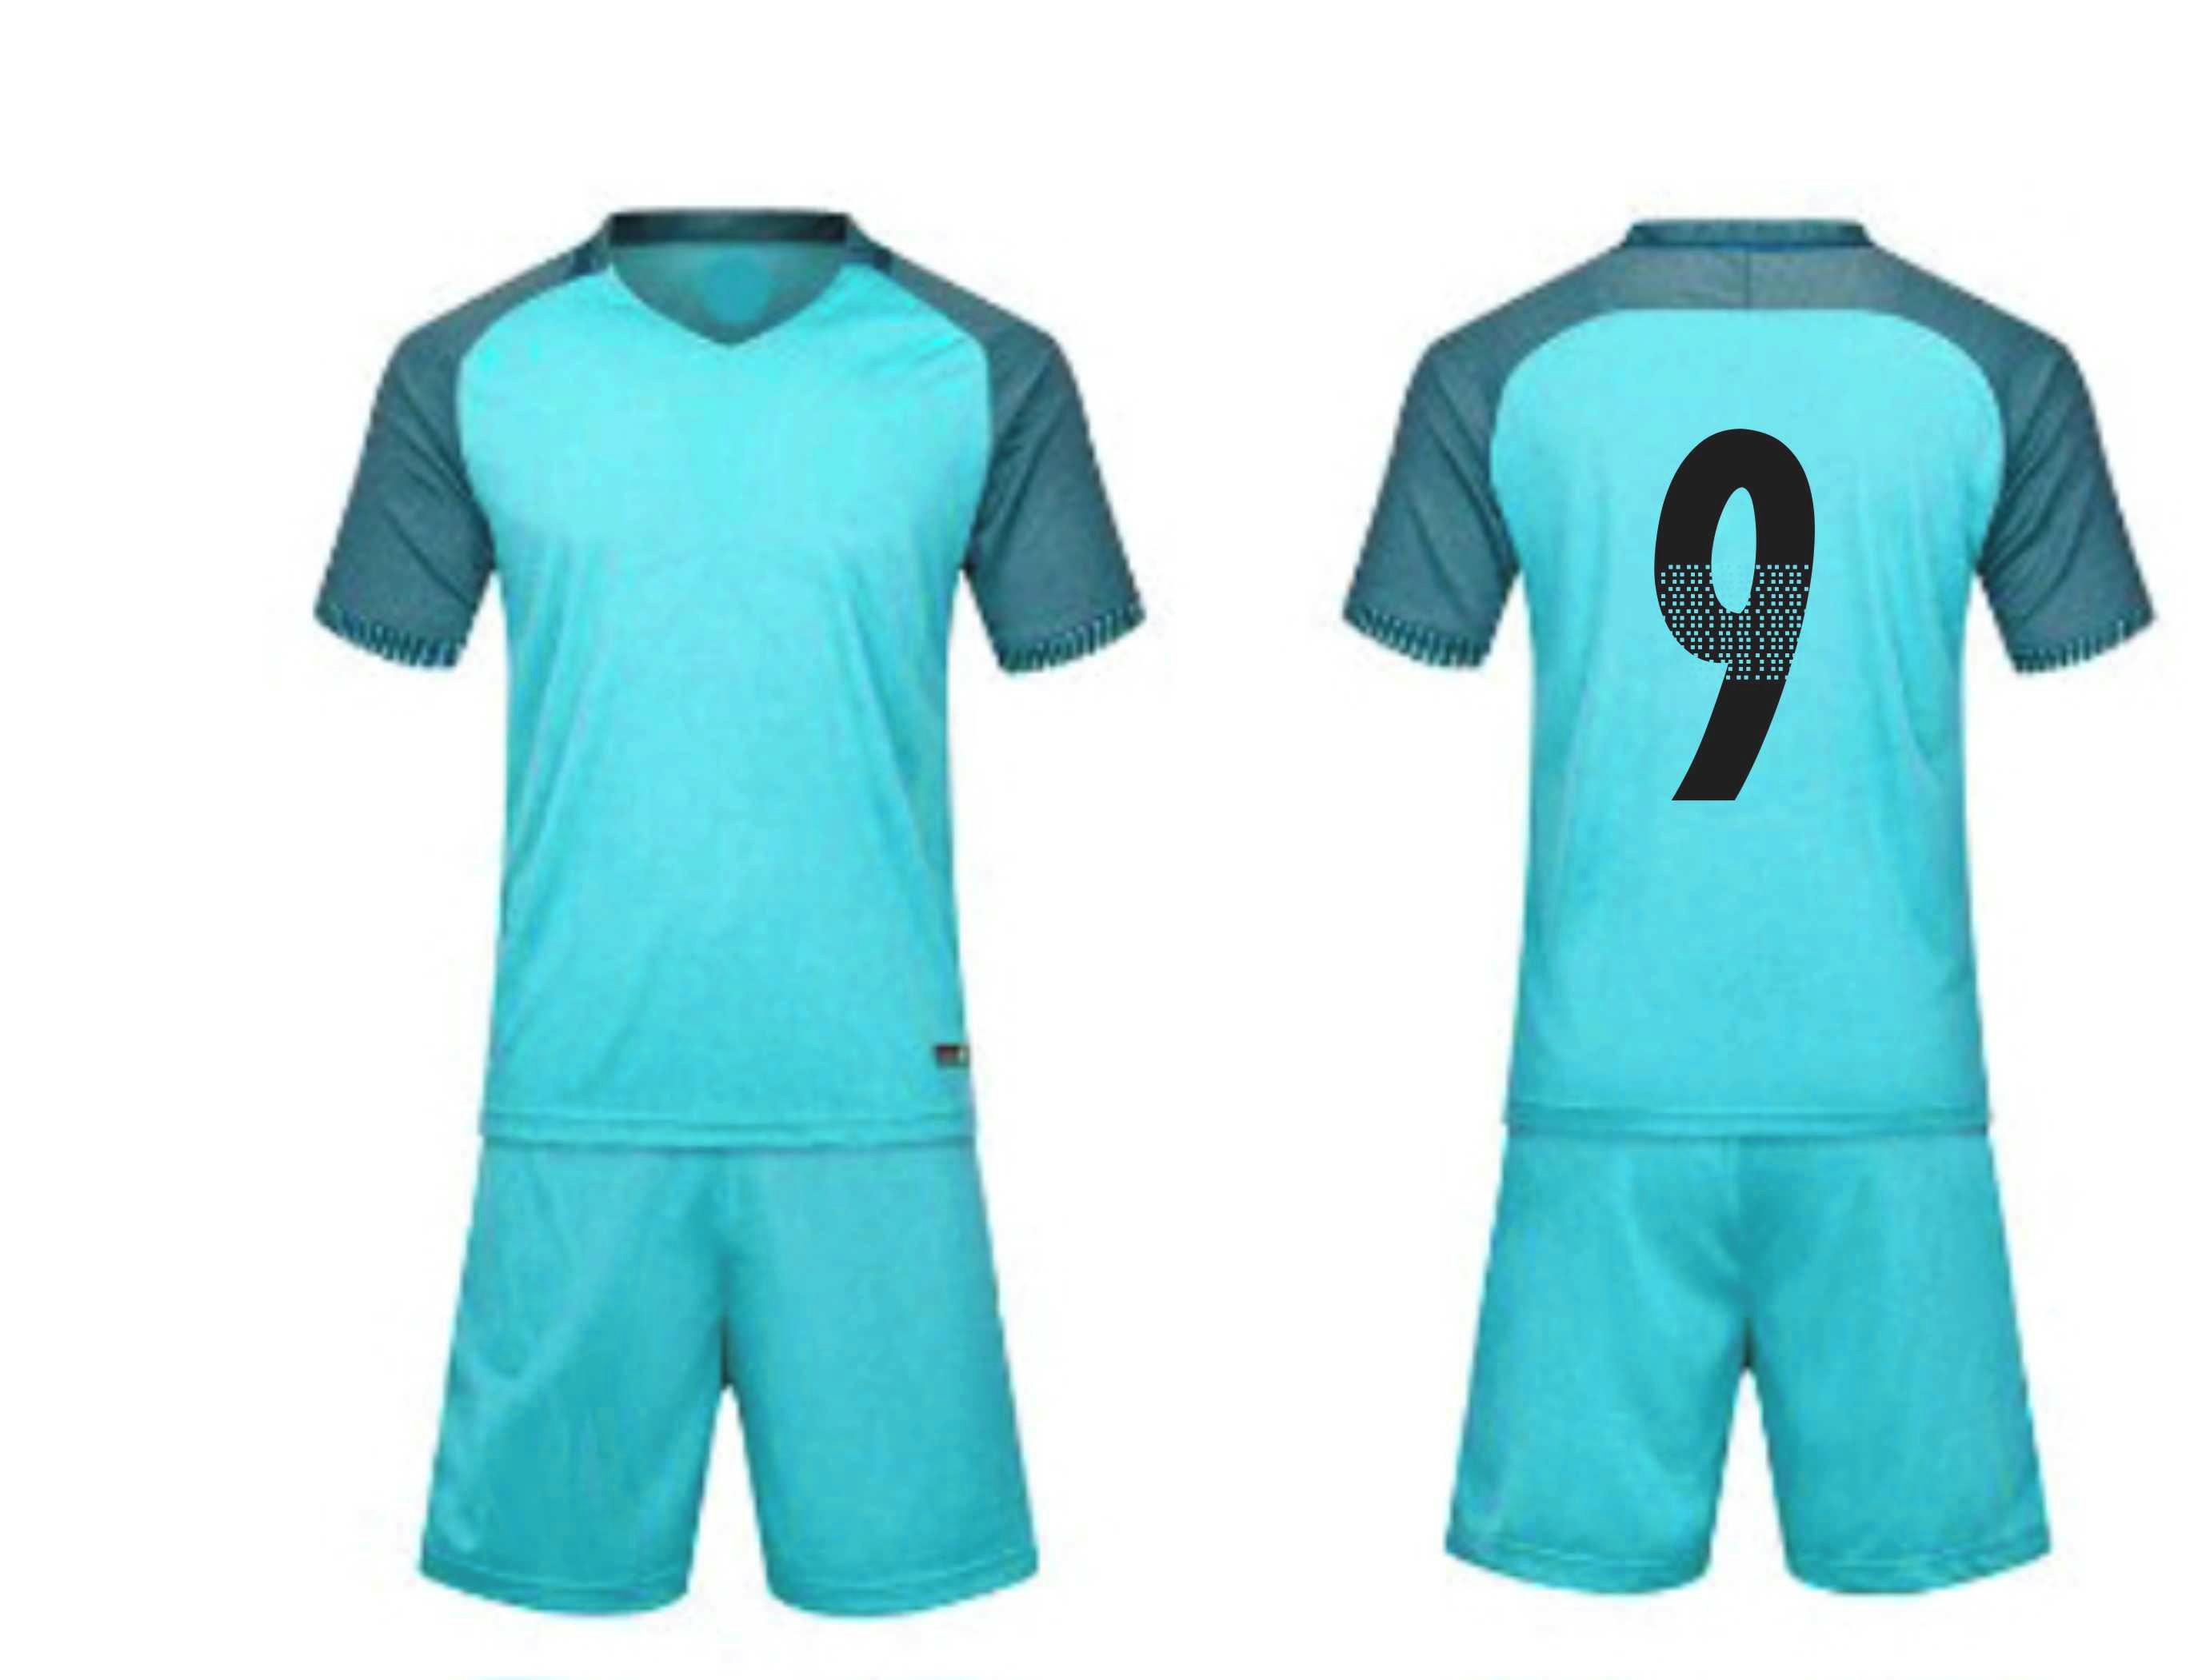 6af60e7c29 Kit Uniforme Futebol Nike | Elo7